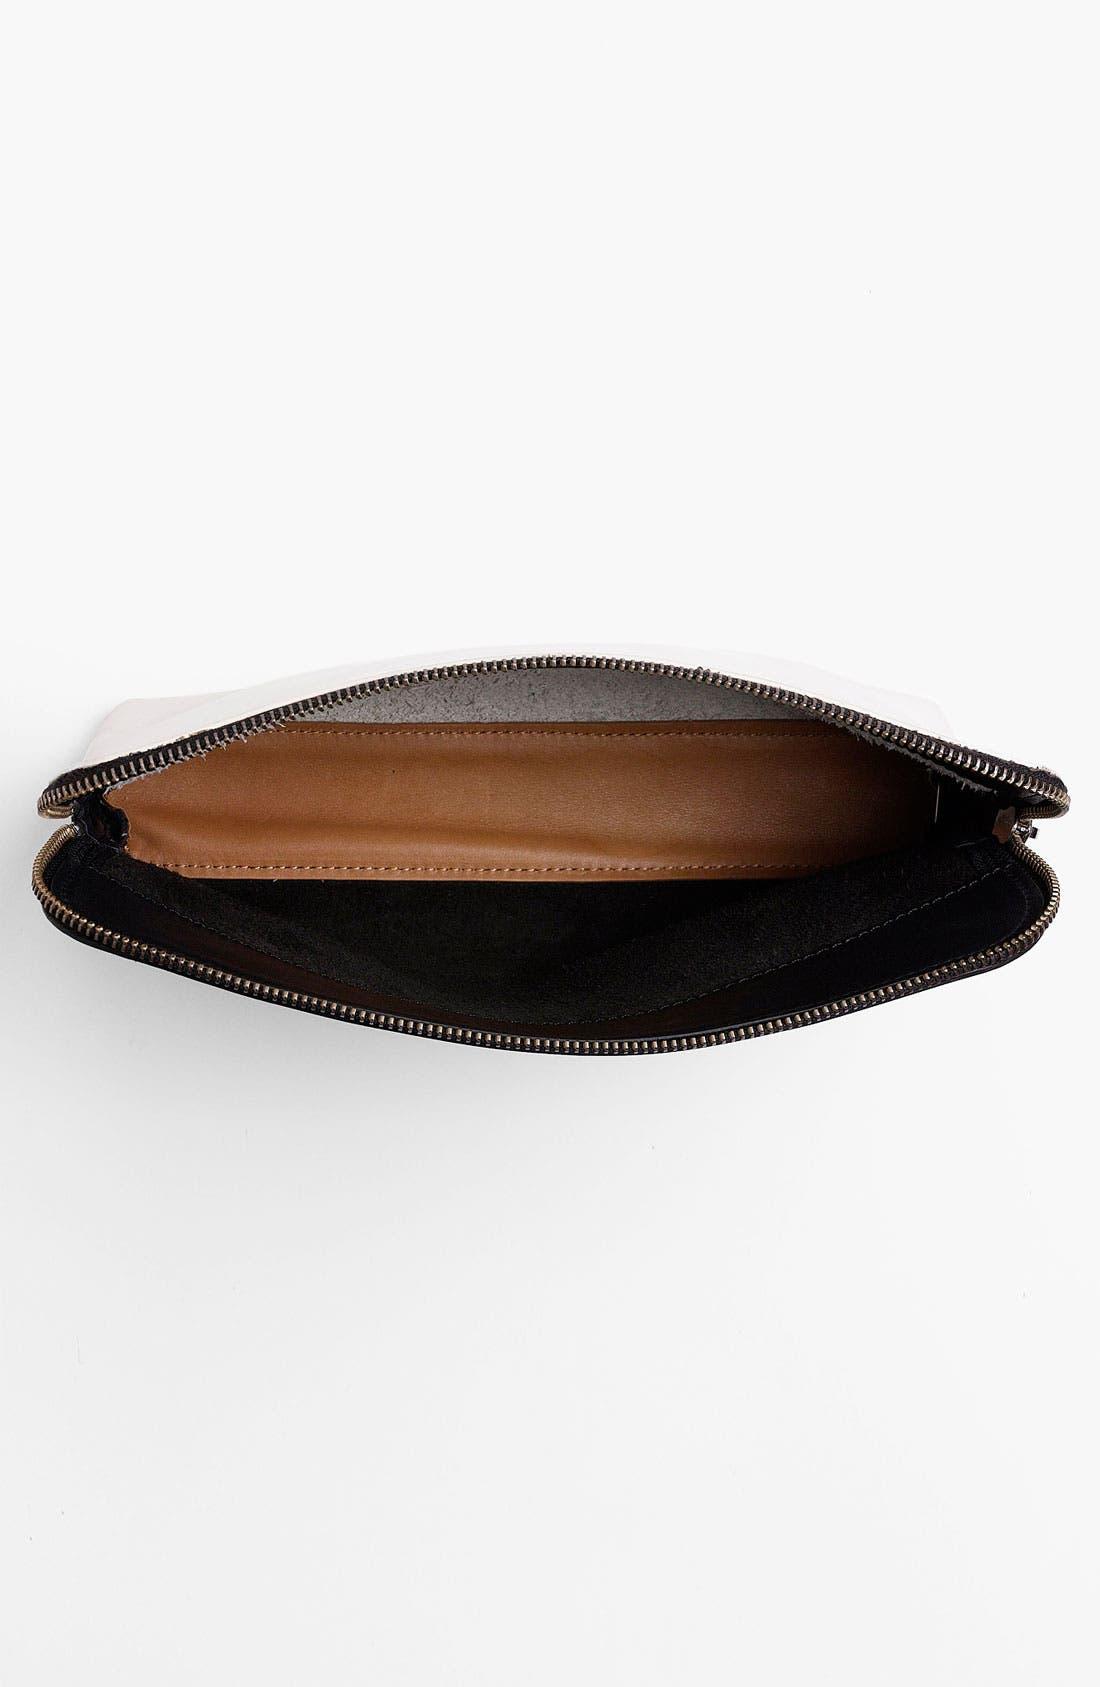 Alternate Image 3  - 3.1 Phillip Lim '31 Minute' Leather Bag